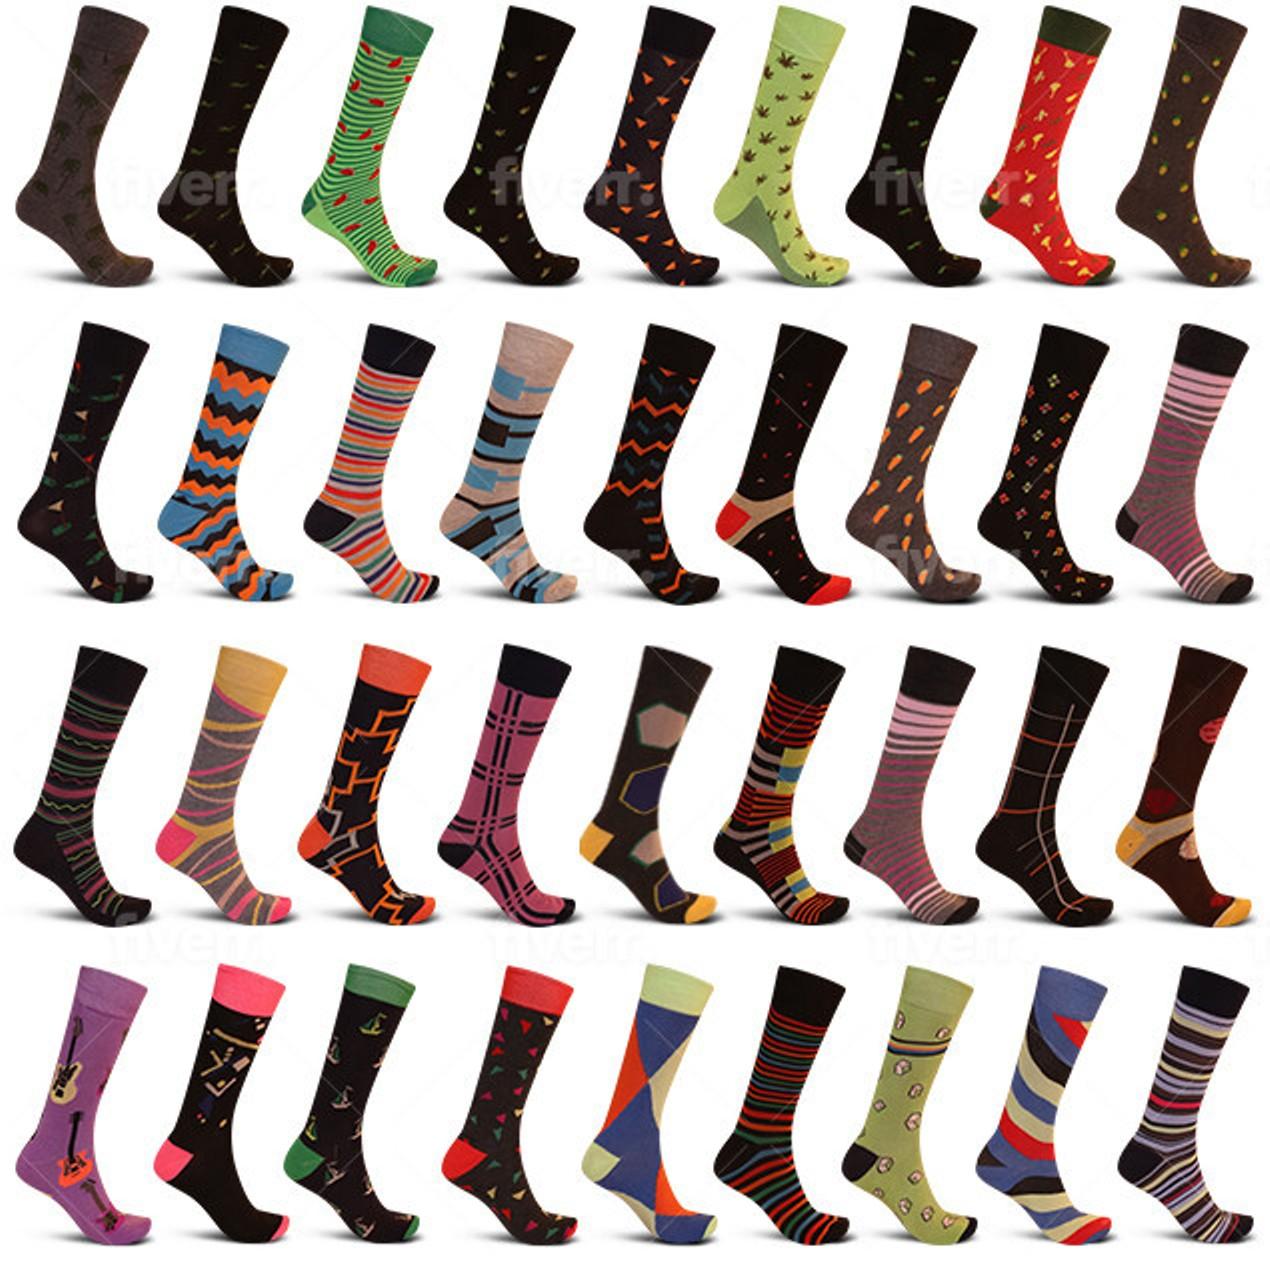 24-Pack Men's James Fiallo Premium Quality Dress Socks